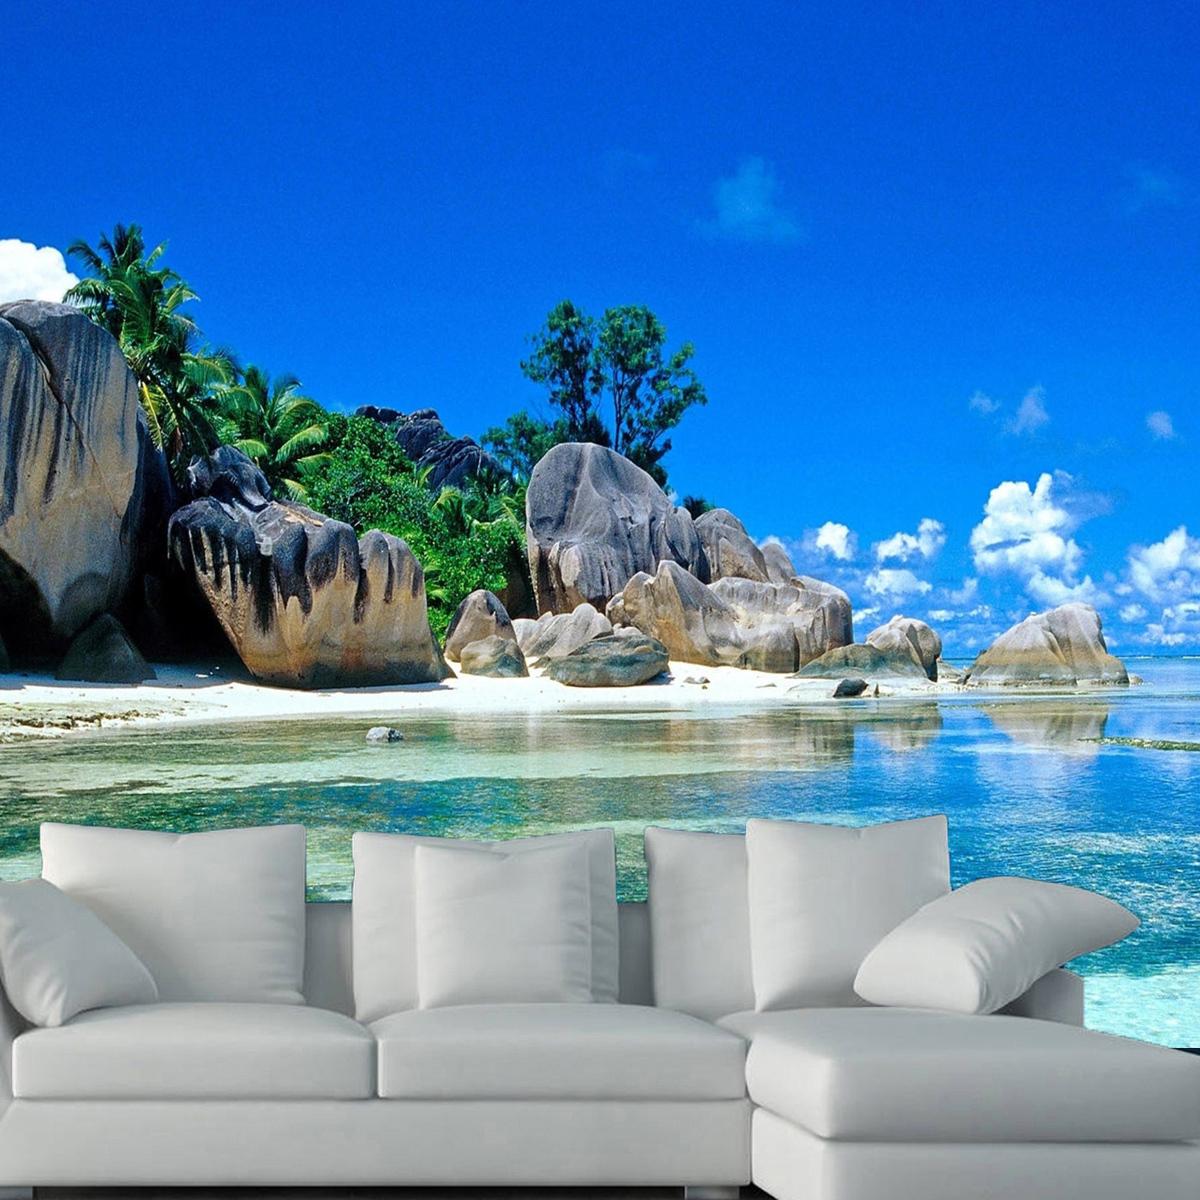 3d large bedroom living mural beach sea island landscape for Beach wall mural sticker